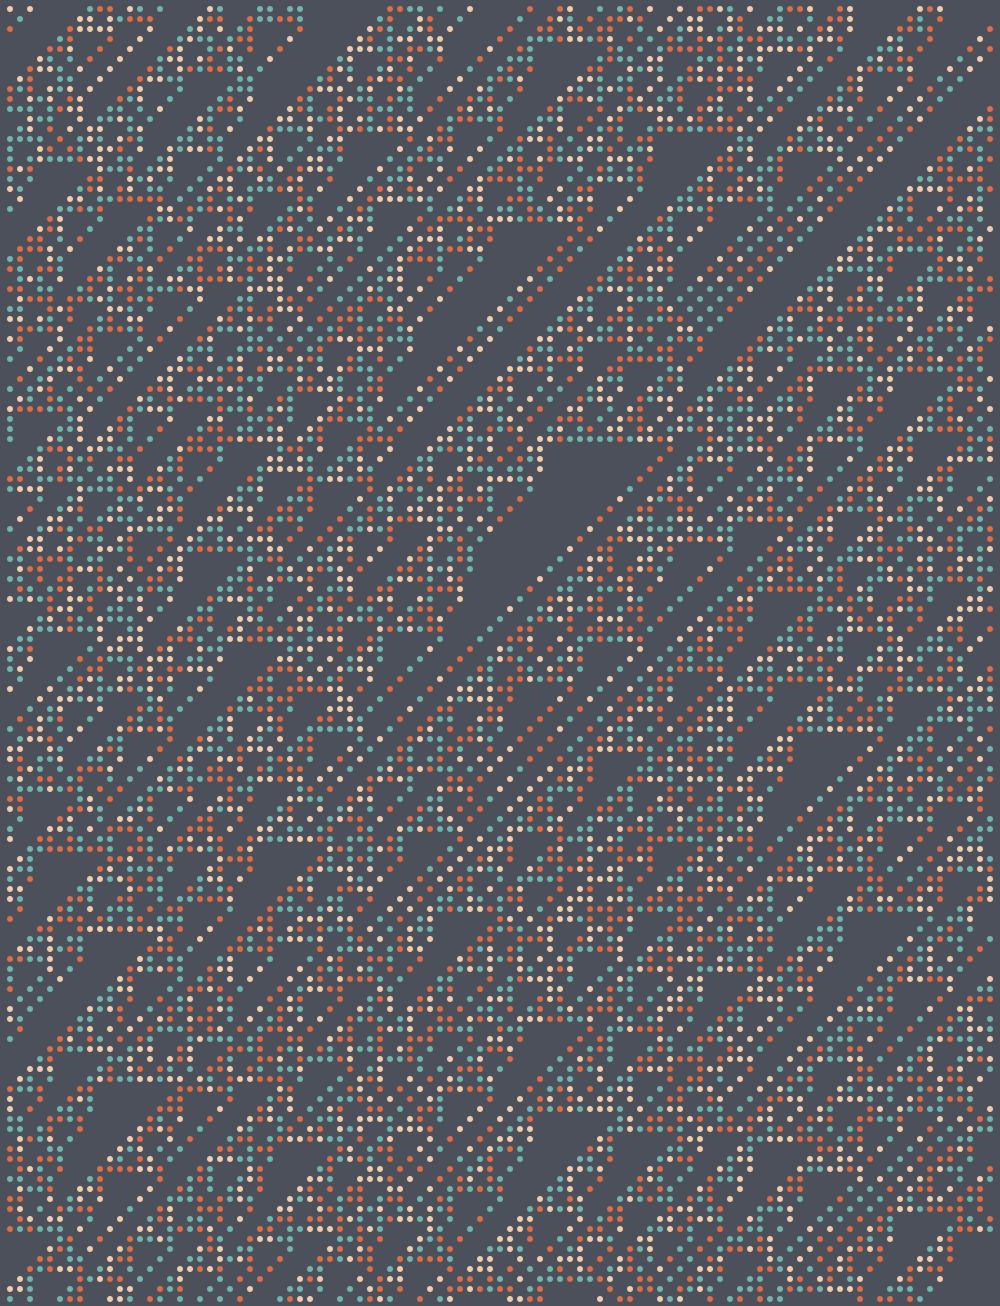 Elementary Automata